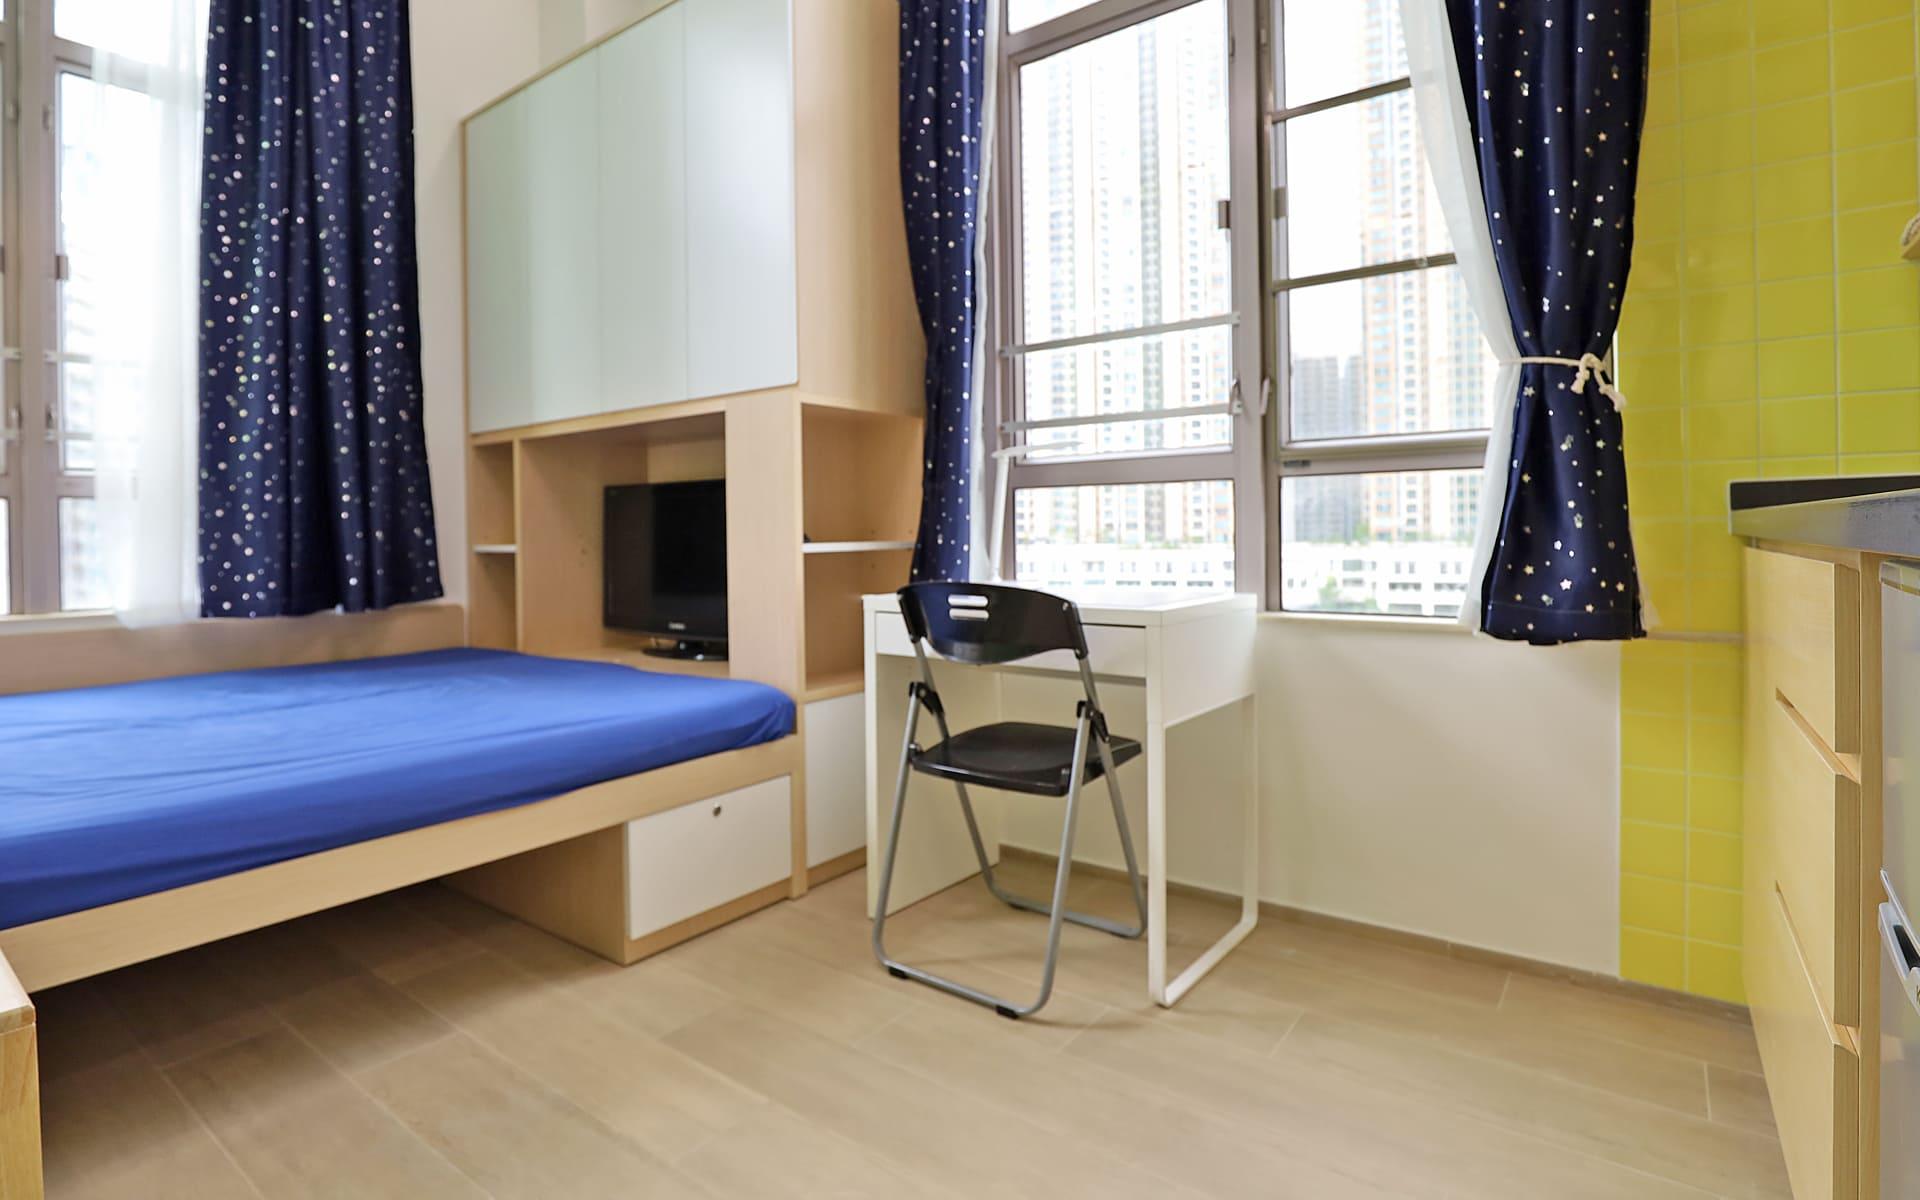 hk_service_apartment_9109723571596694740.jpg